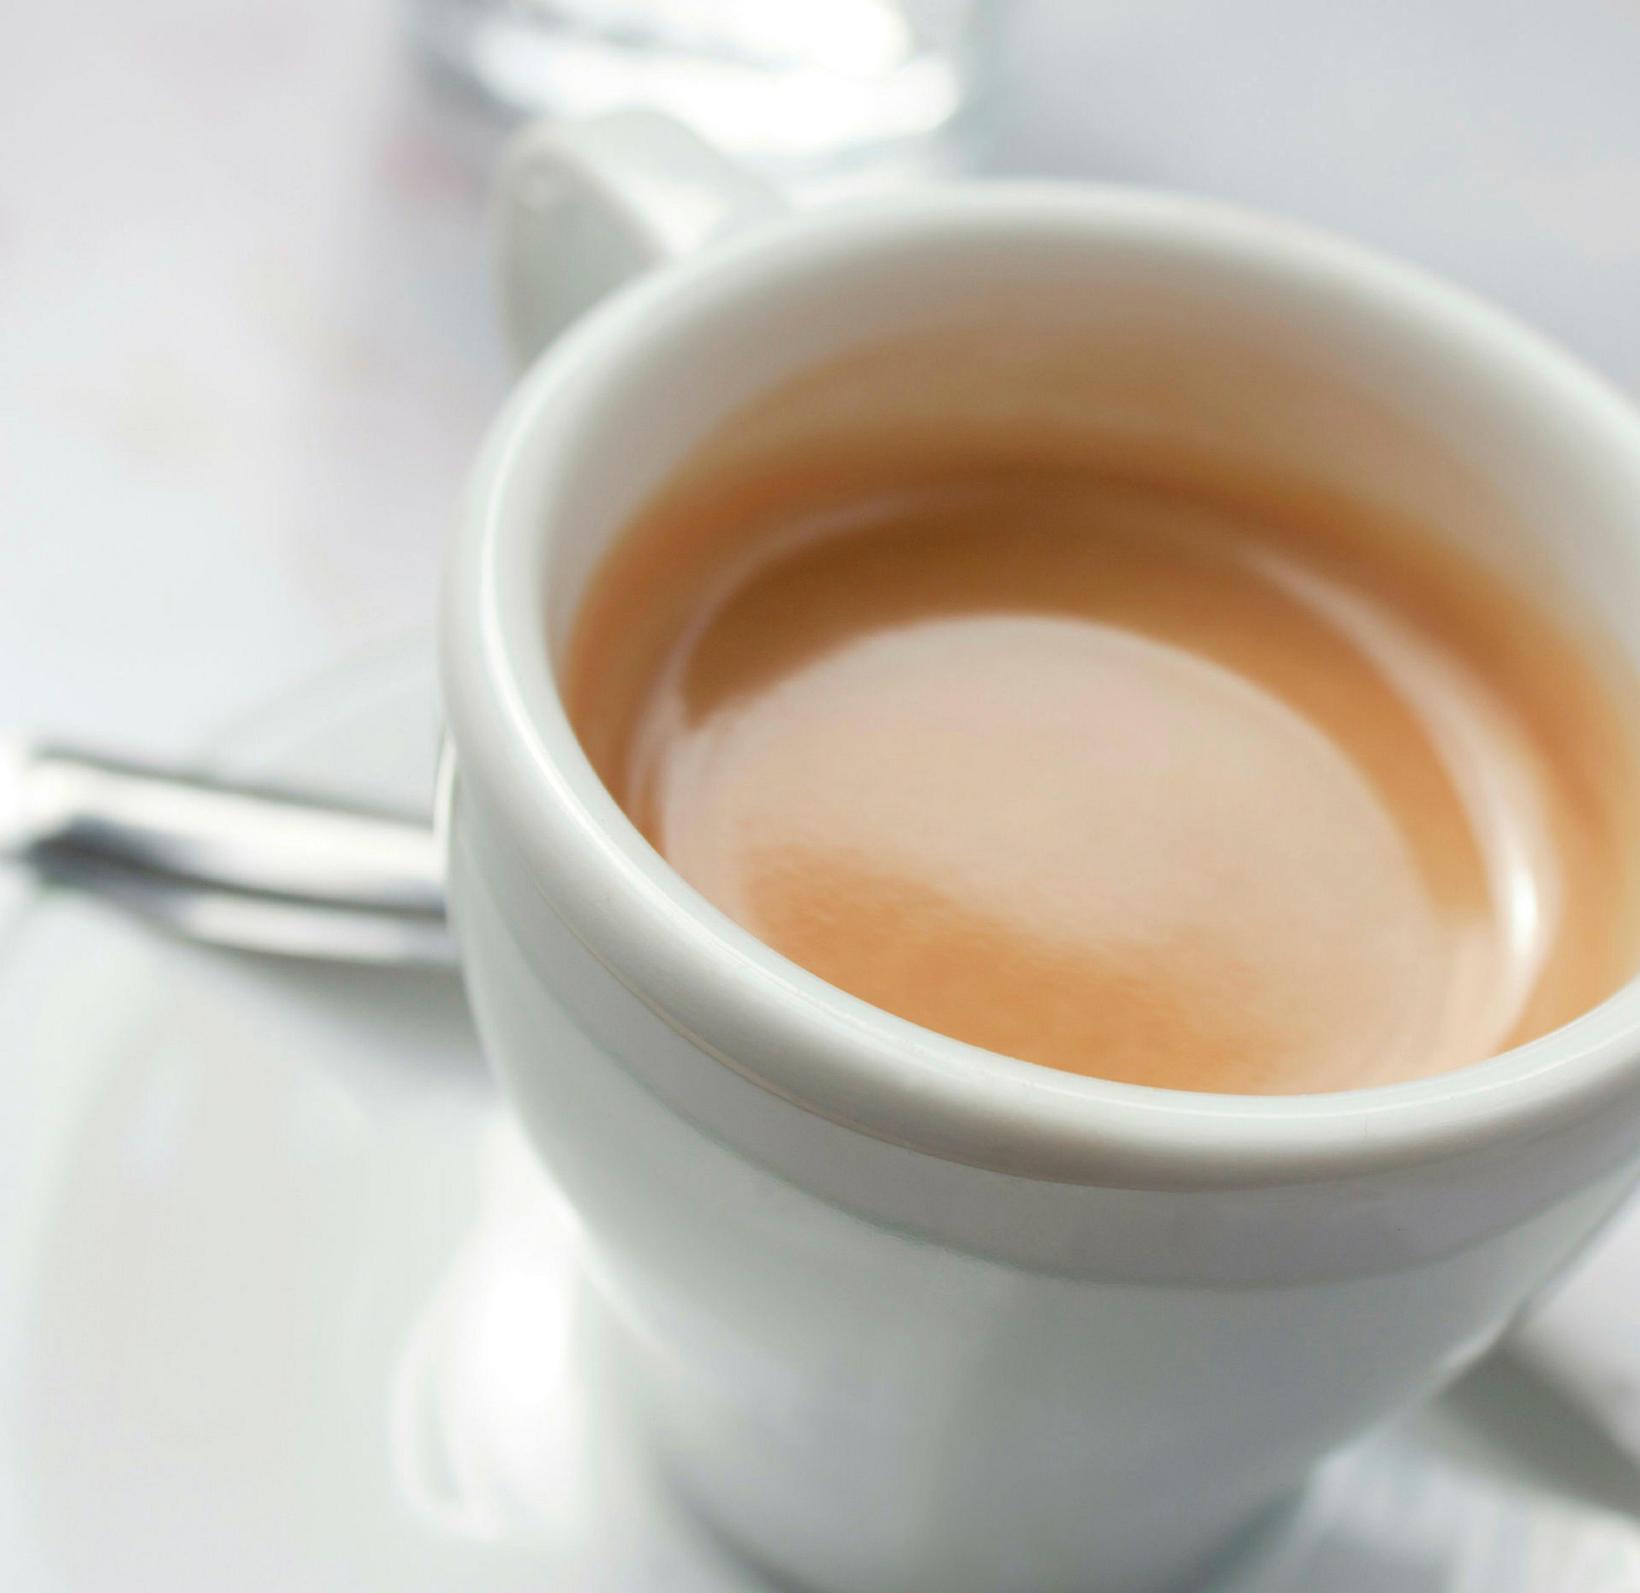 Pétur fær sér espresso í morgunmat.